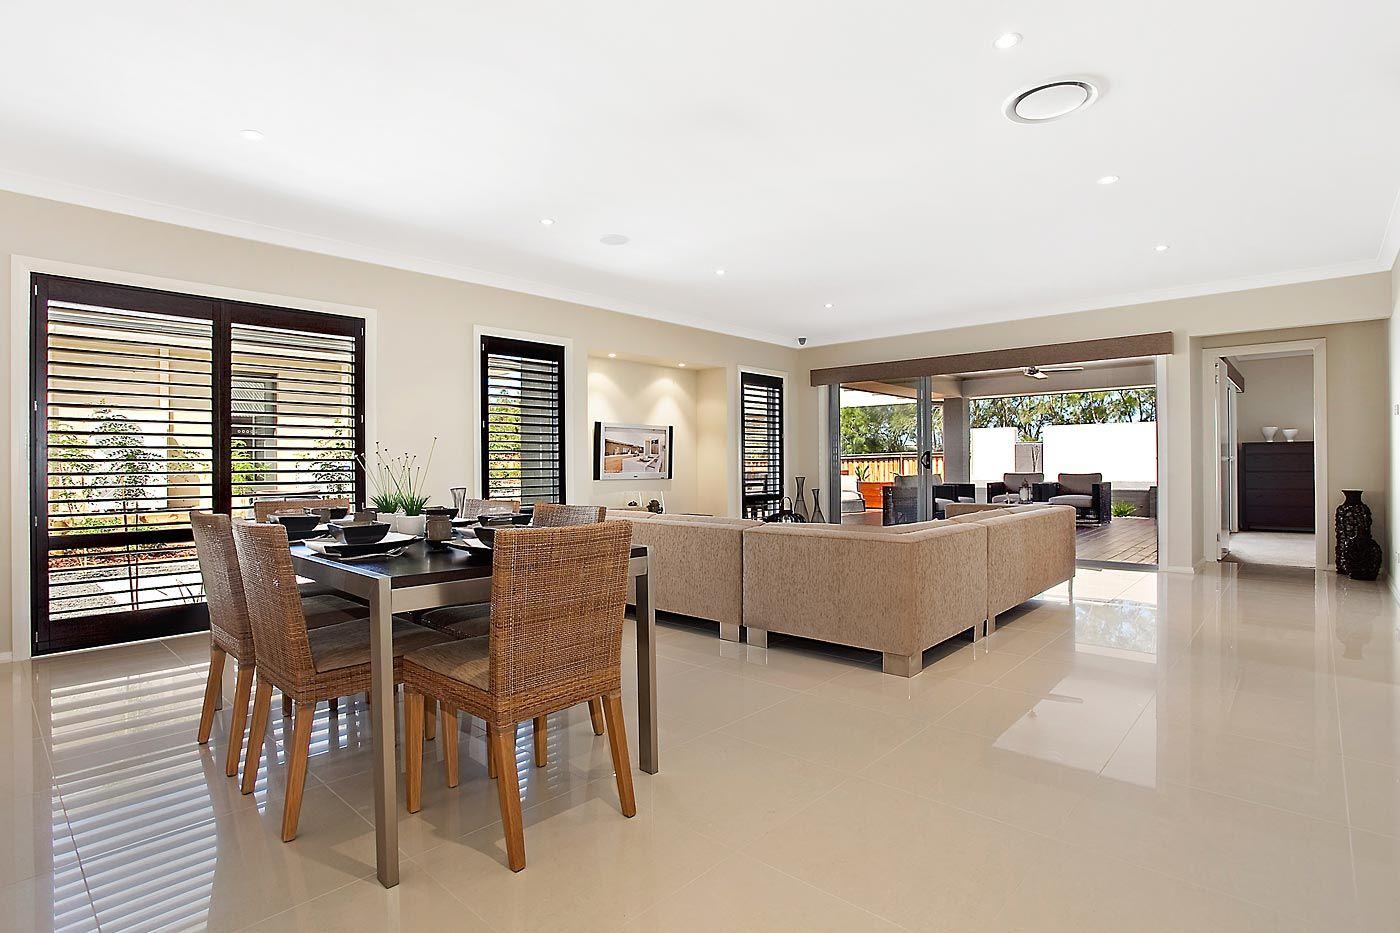 Acreage Home Designs Queensland Rare Design Room Nice design quotes House